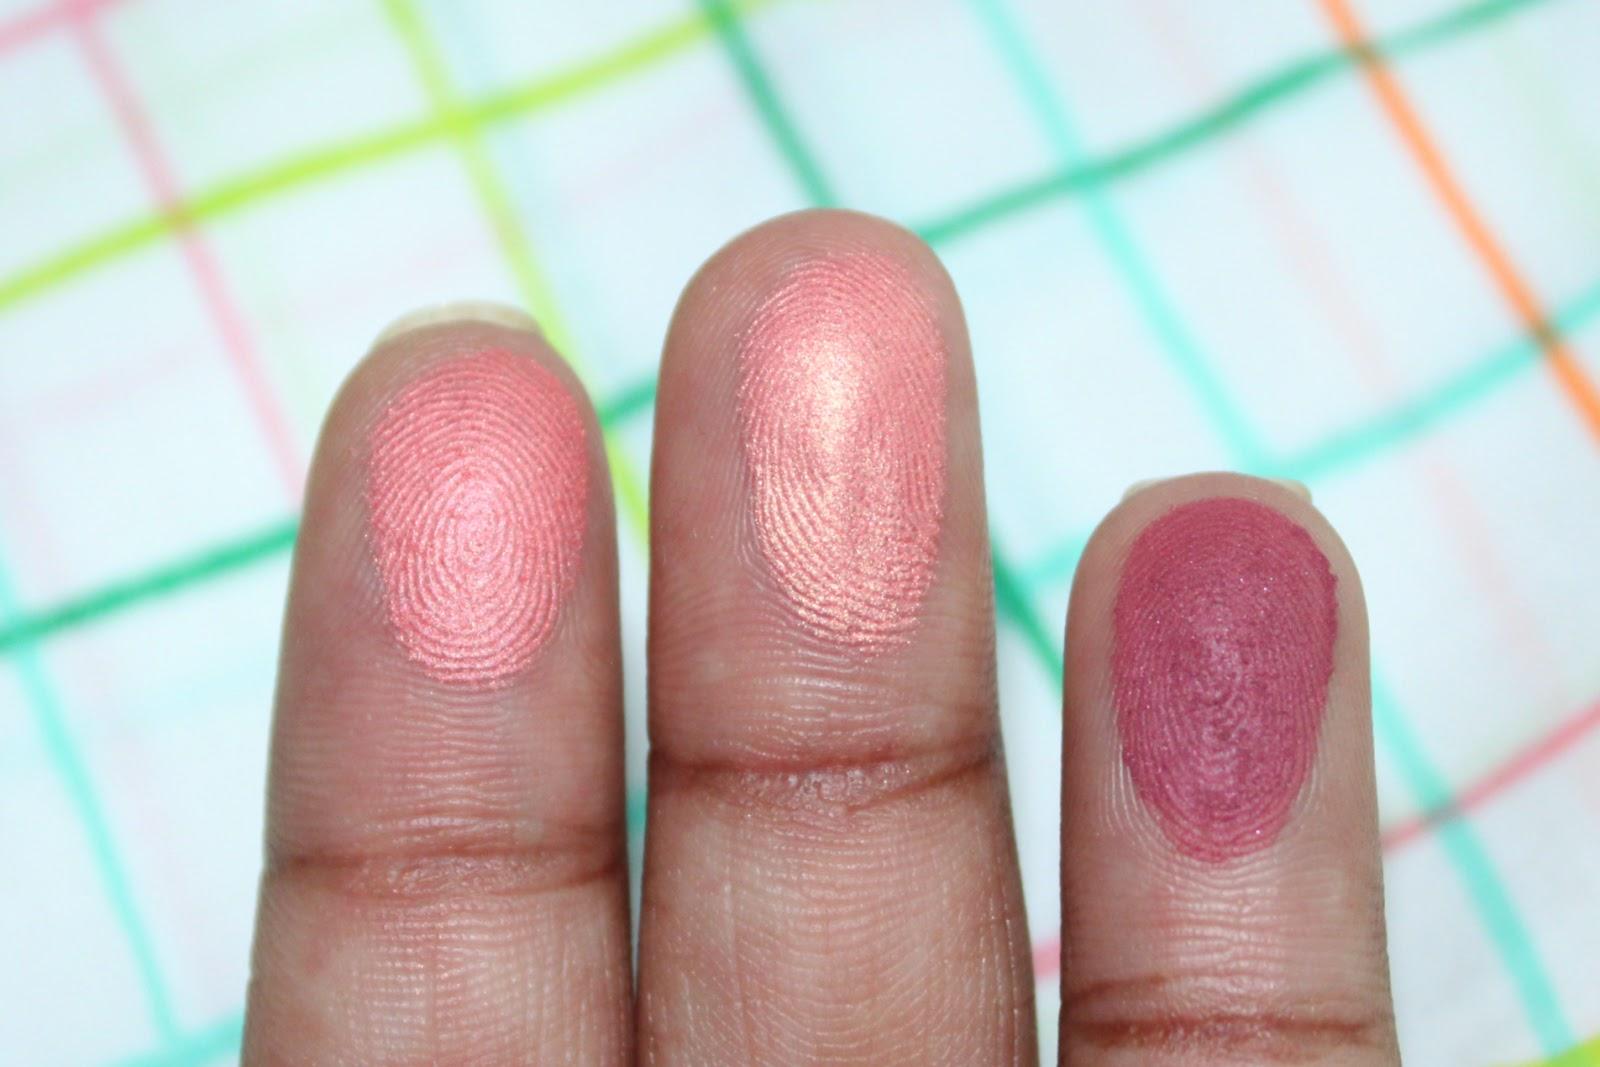 MAC BLUSH COLLECTION | Makeup and Beauty Mayhem